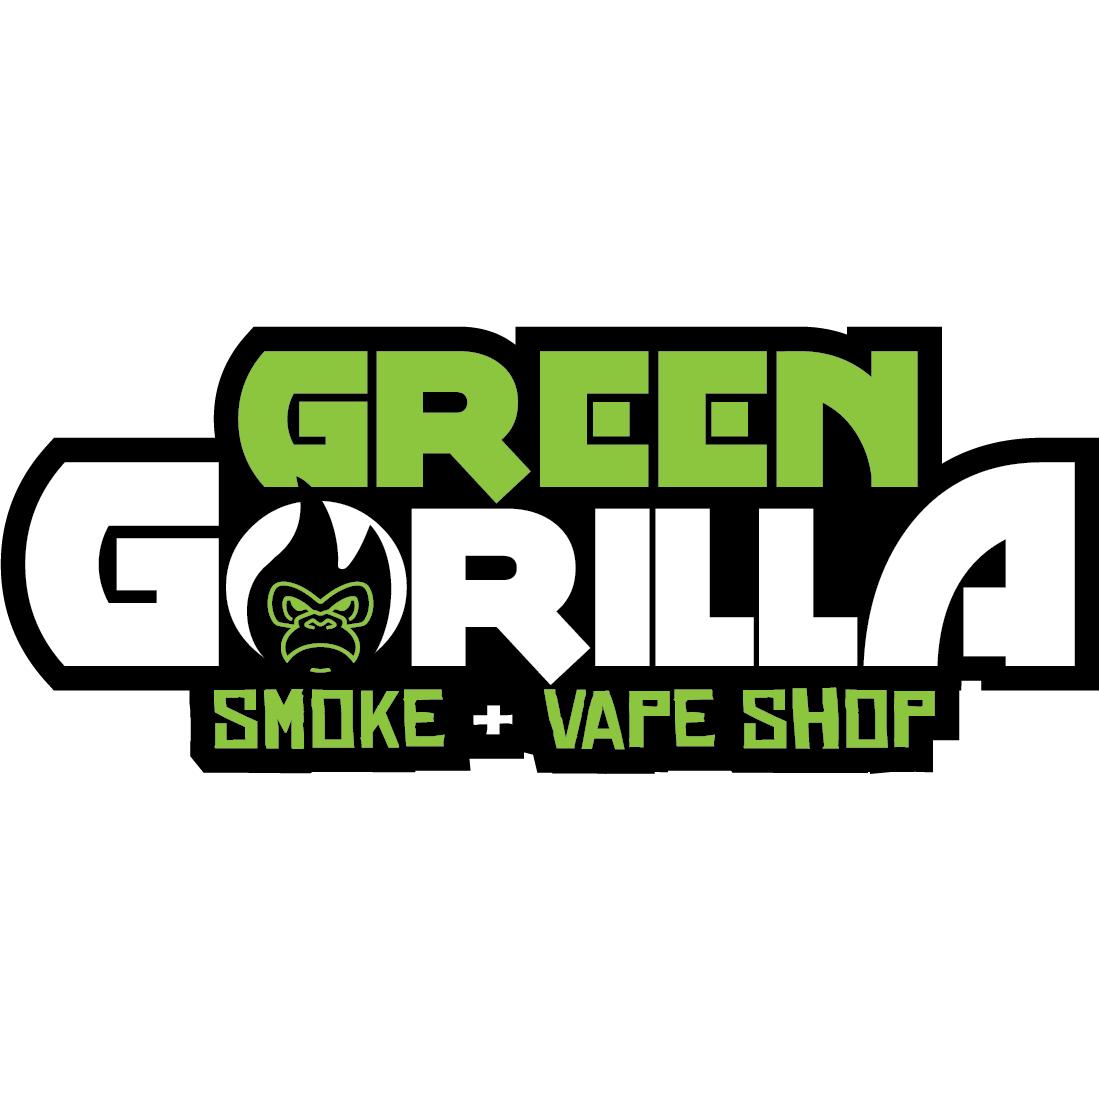 Green Gorilla Smoke & Vape Shop